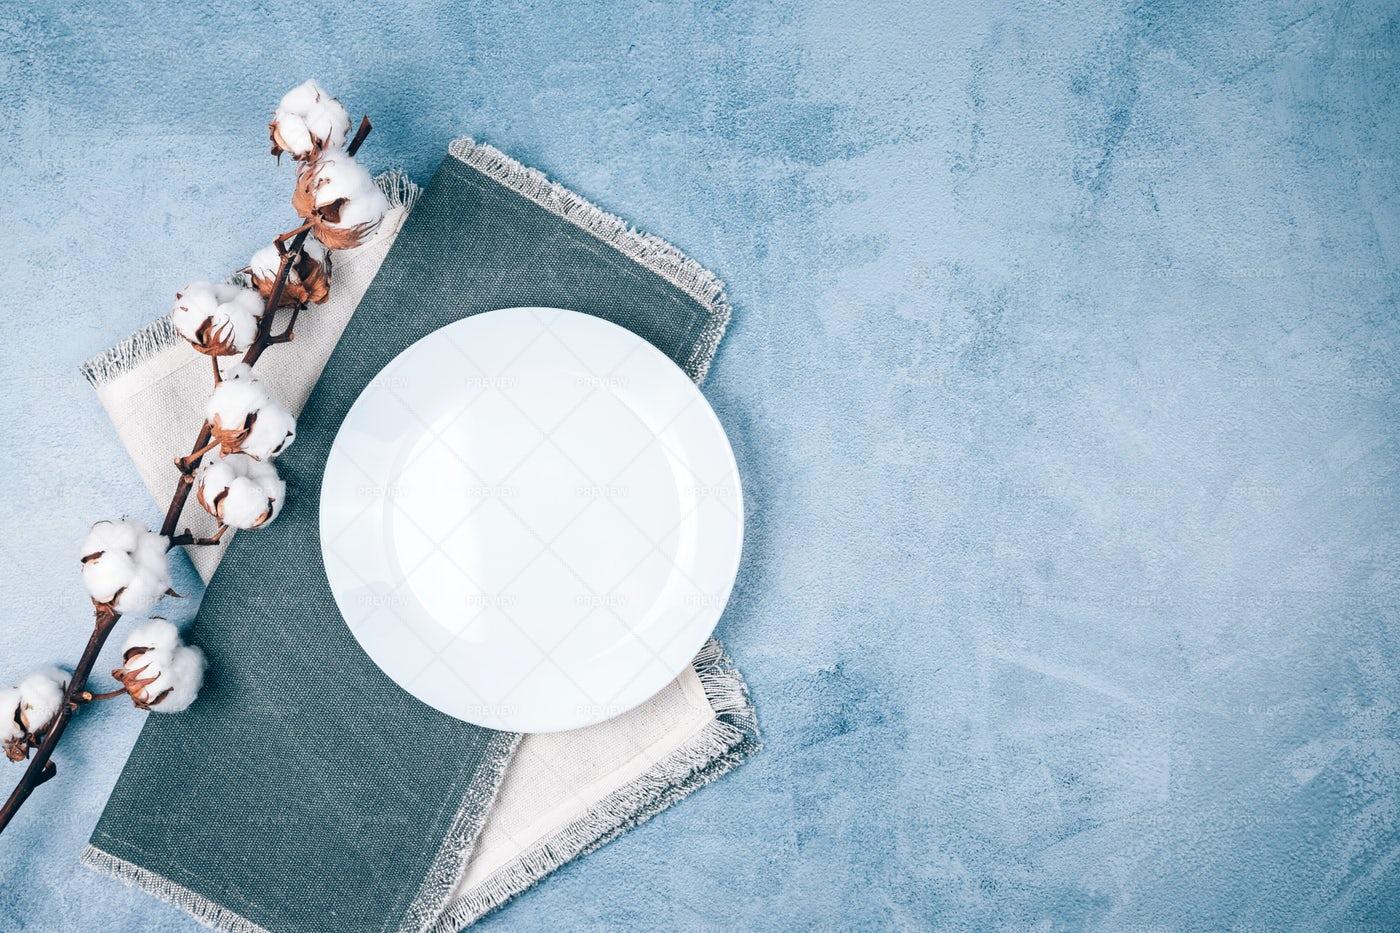 Plate On Linen Napkins: Stock Photos